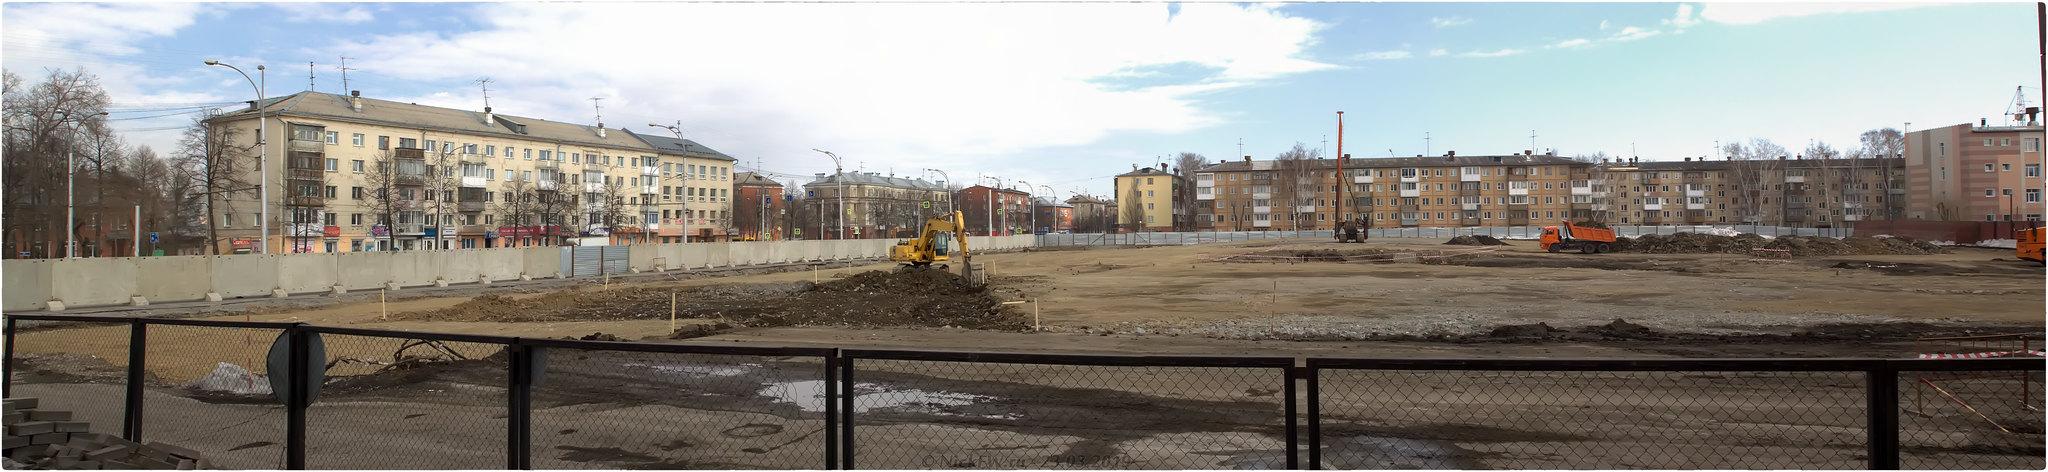 15. Панорама территории будущего Парка Ангелов © NickFW.ru - 23.03.2019г.